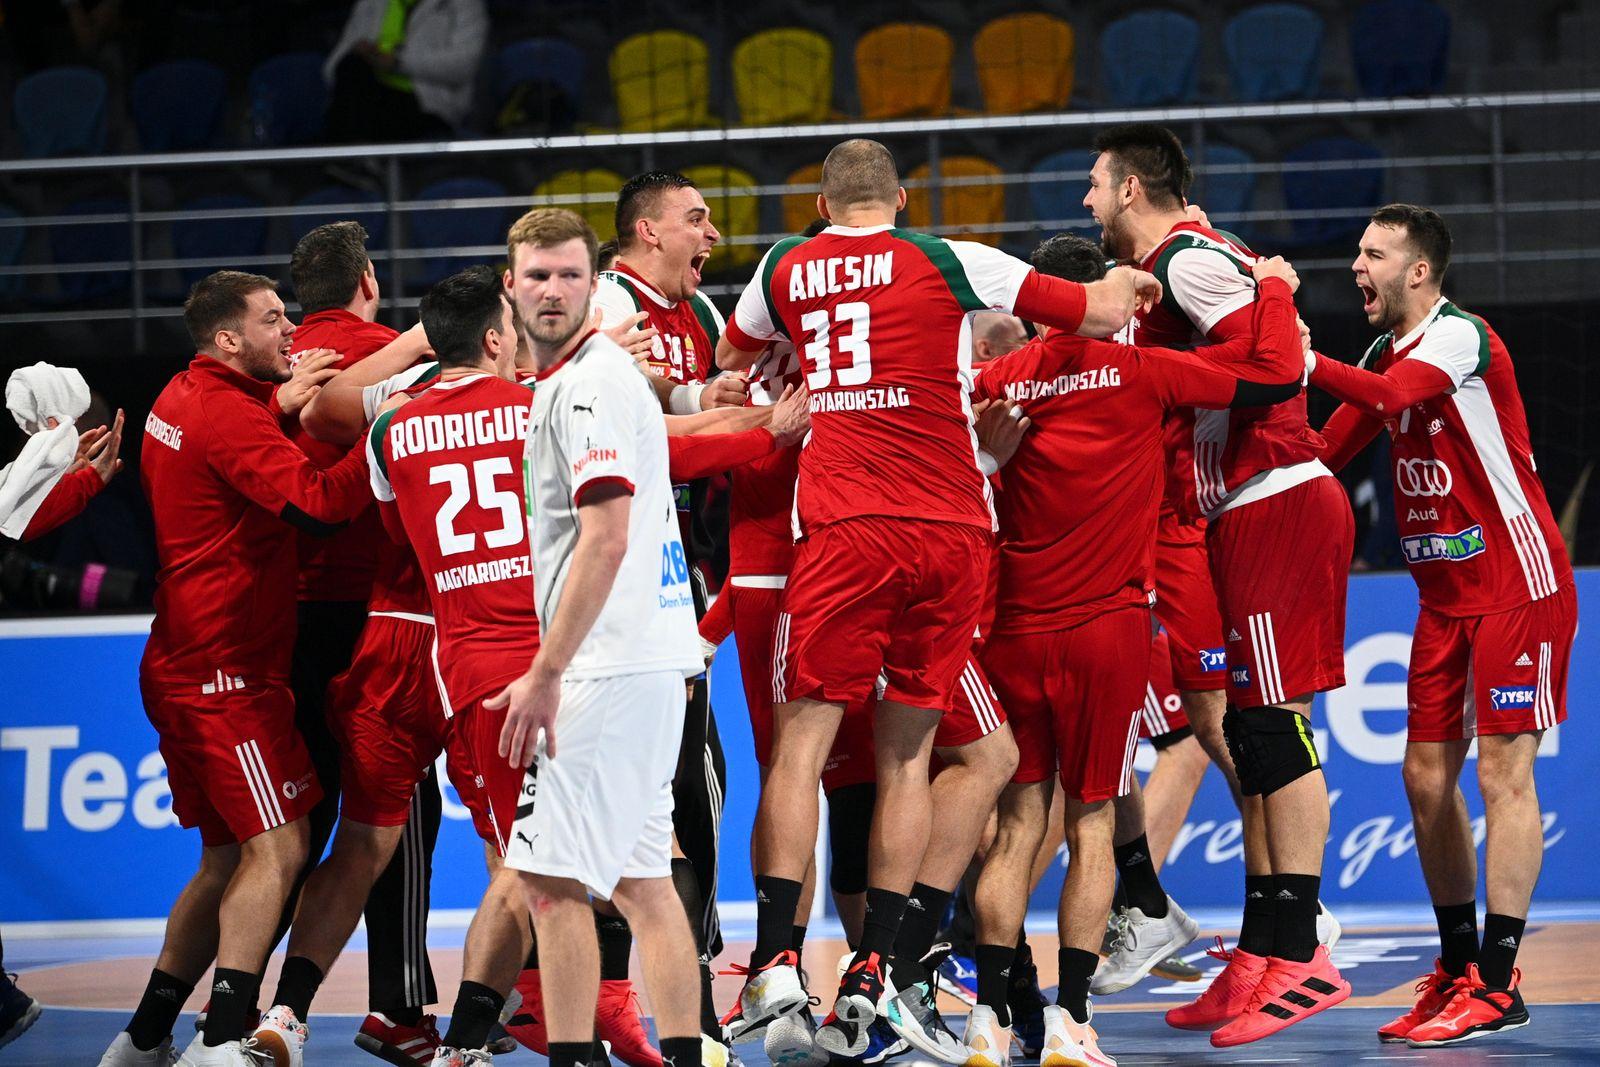 Men Handball World Championship 2021, Cairo, Egypt - 19 Jan 2021